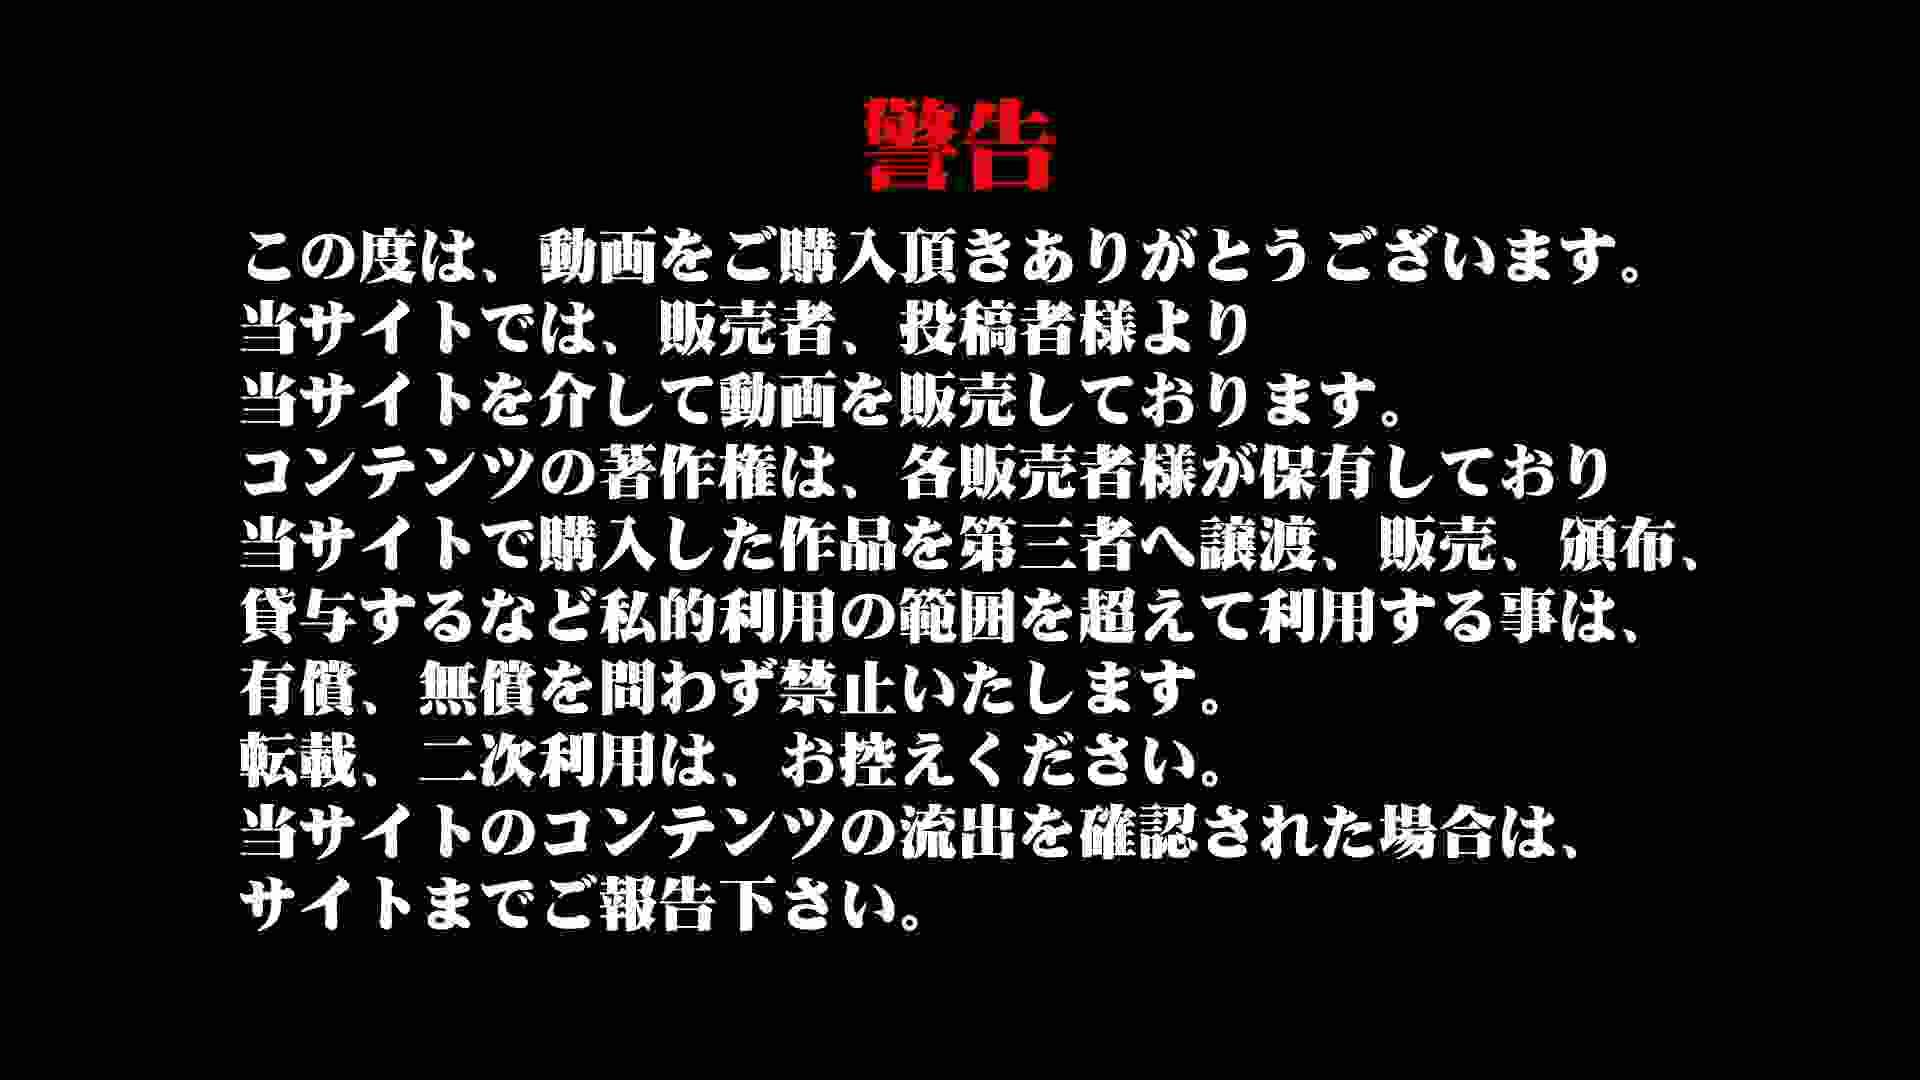 Aquaな露天風呂Vol.891 0 | 0  69連発 1